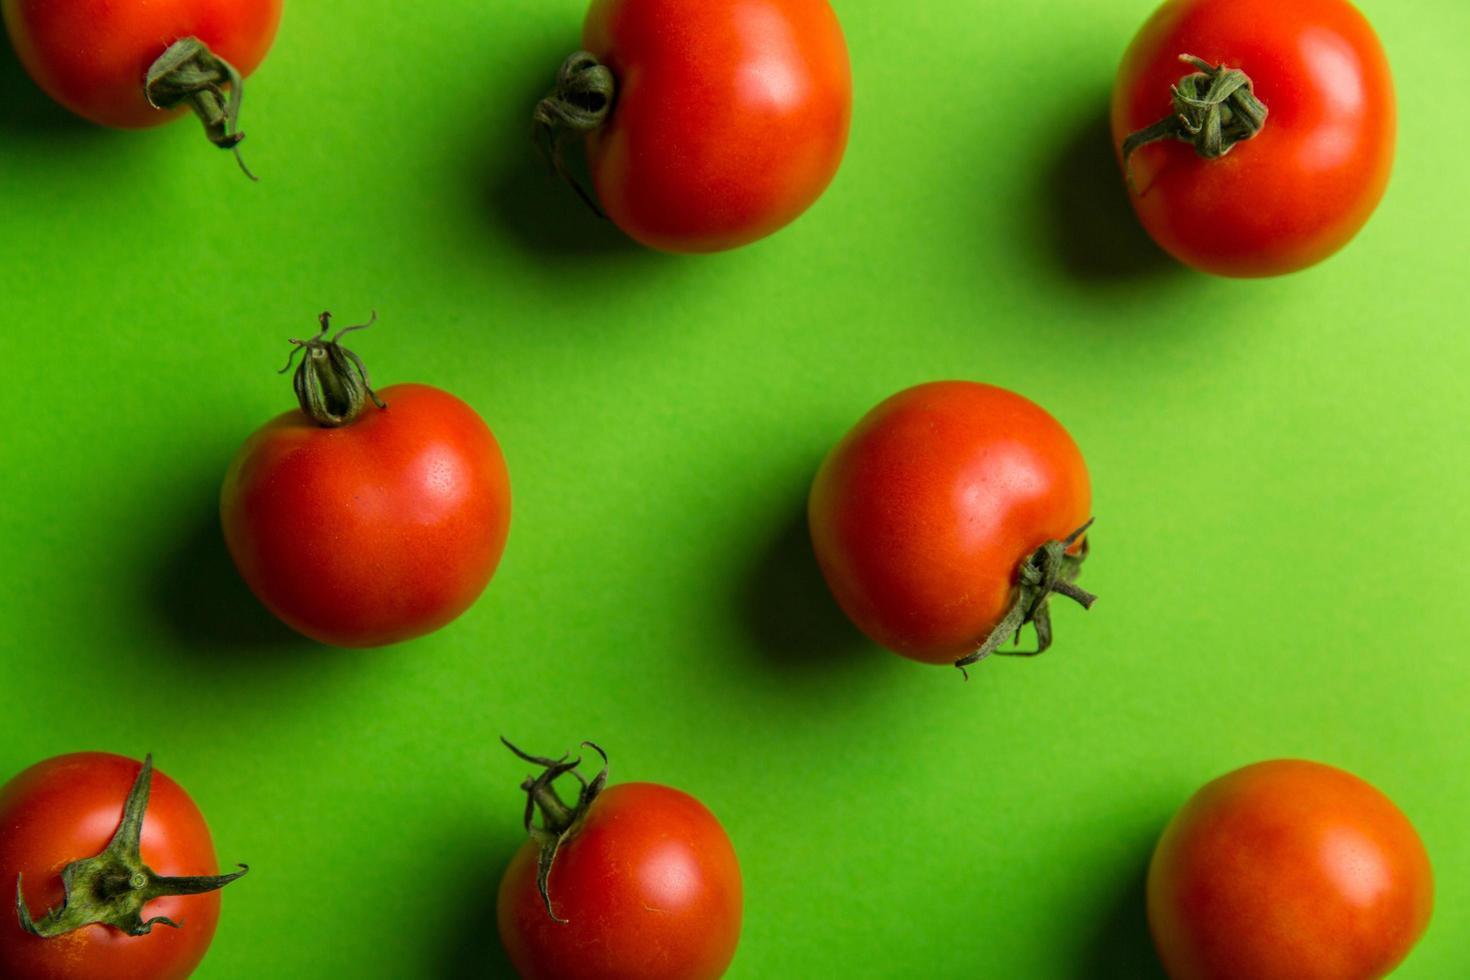 mogna tomater på grön bakgrund foto